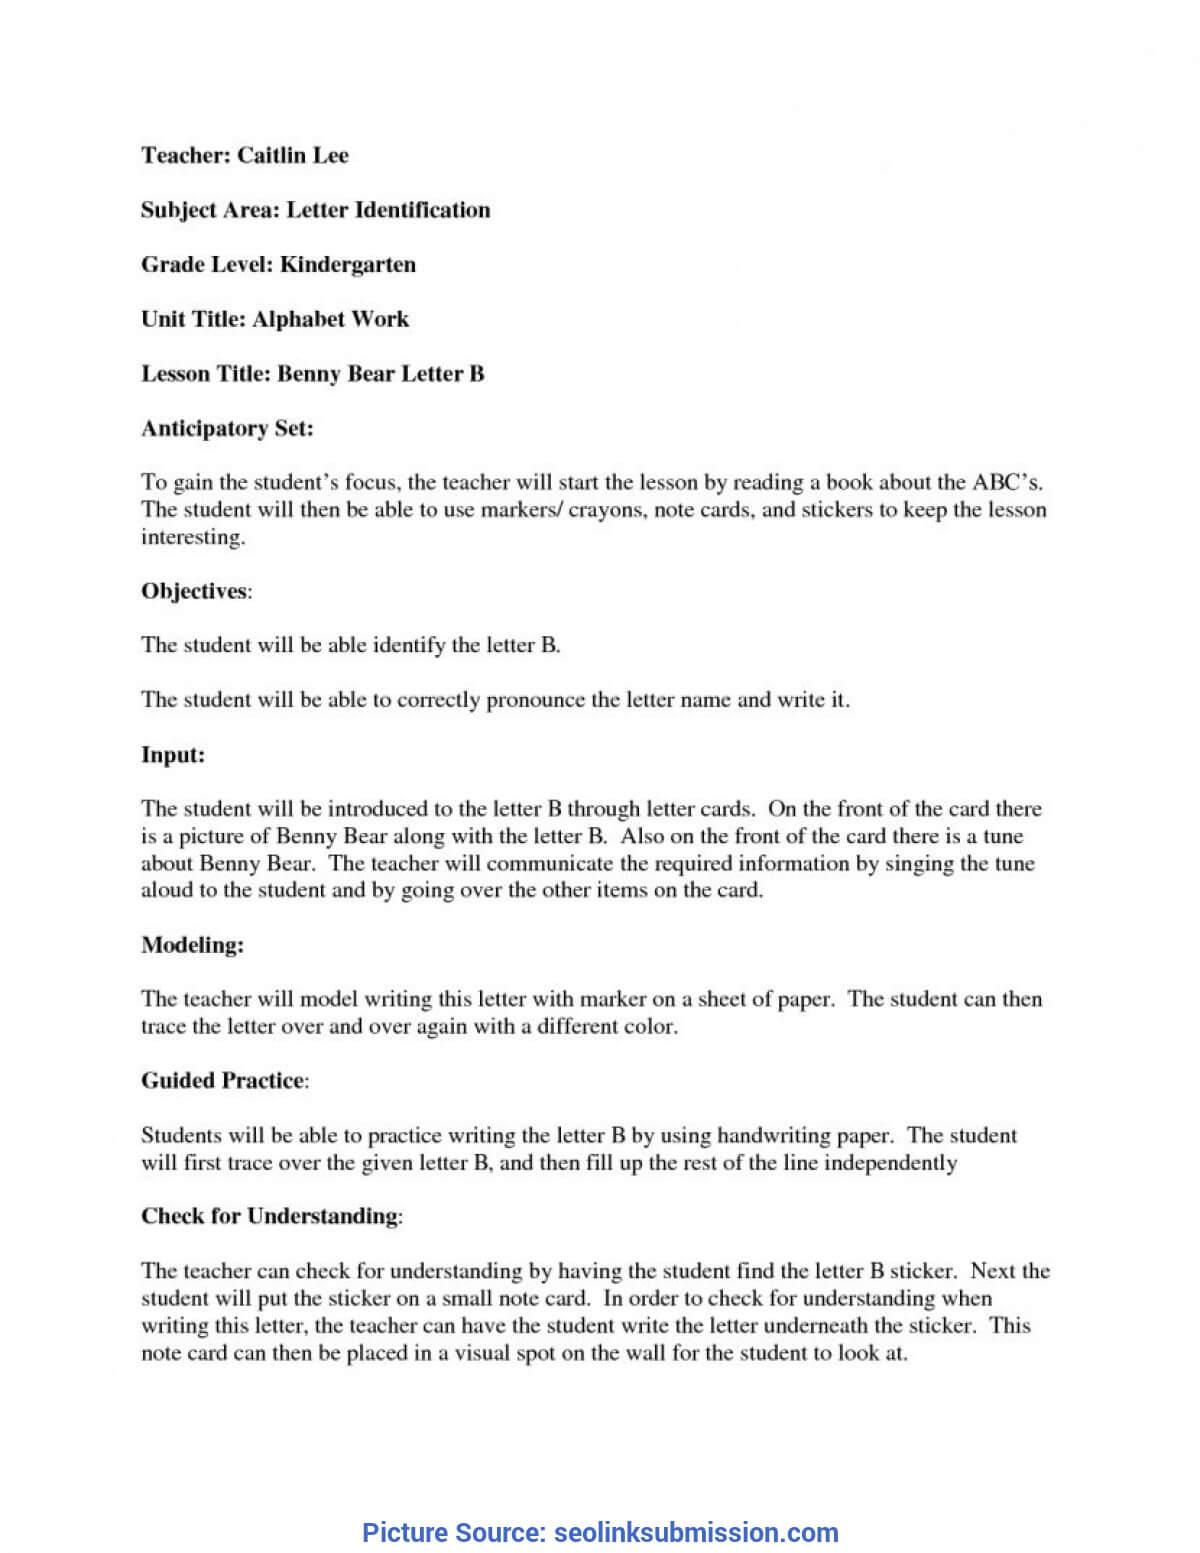 Interesting Madeline Hunter Lesson Plan Example Kindergarten throughout Madeline Hunter Lesson Plan Template Blank